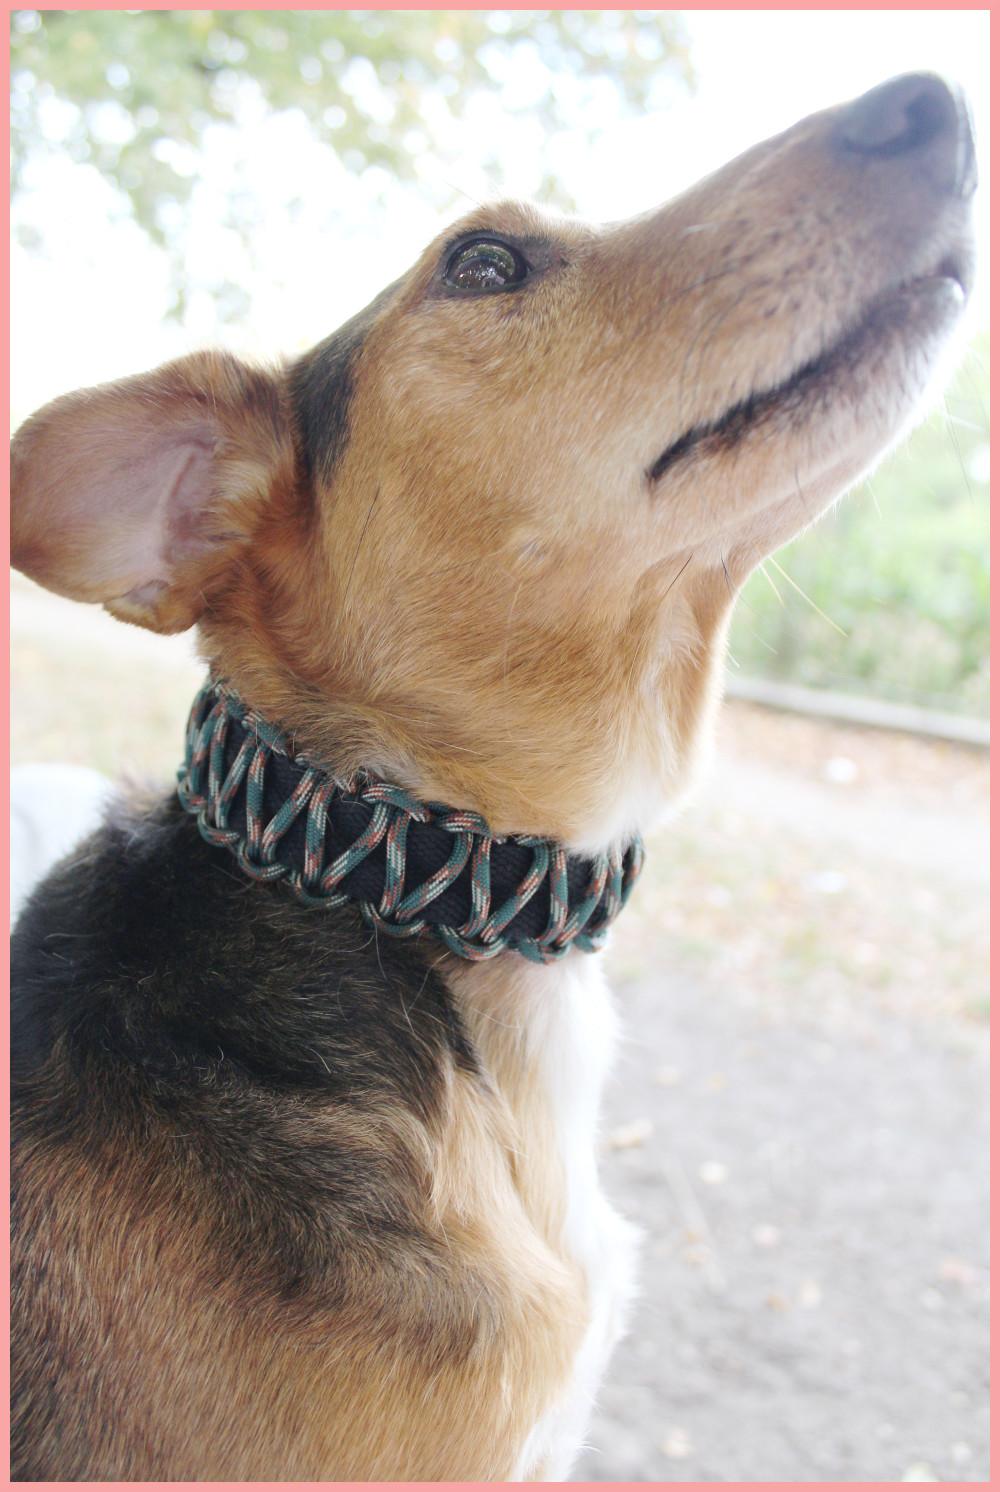 Hundehalsband selber machen mit frau friemel